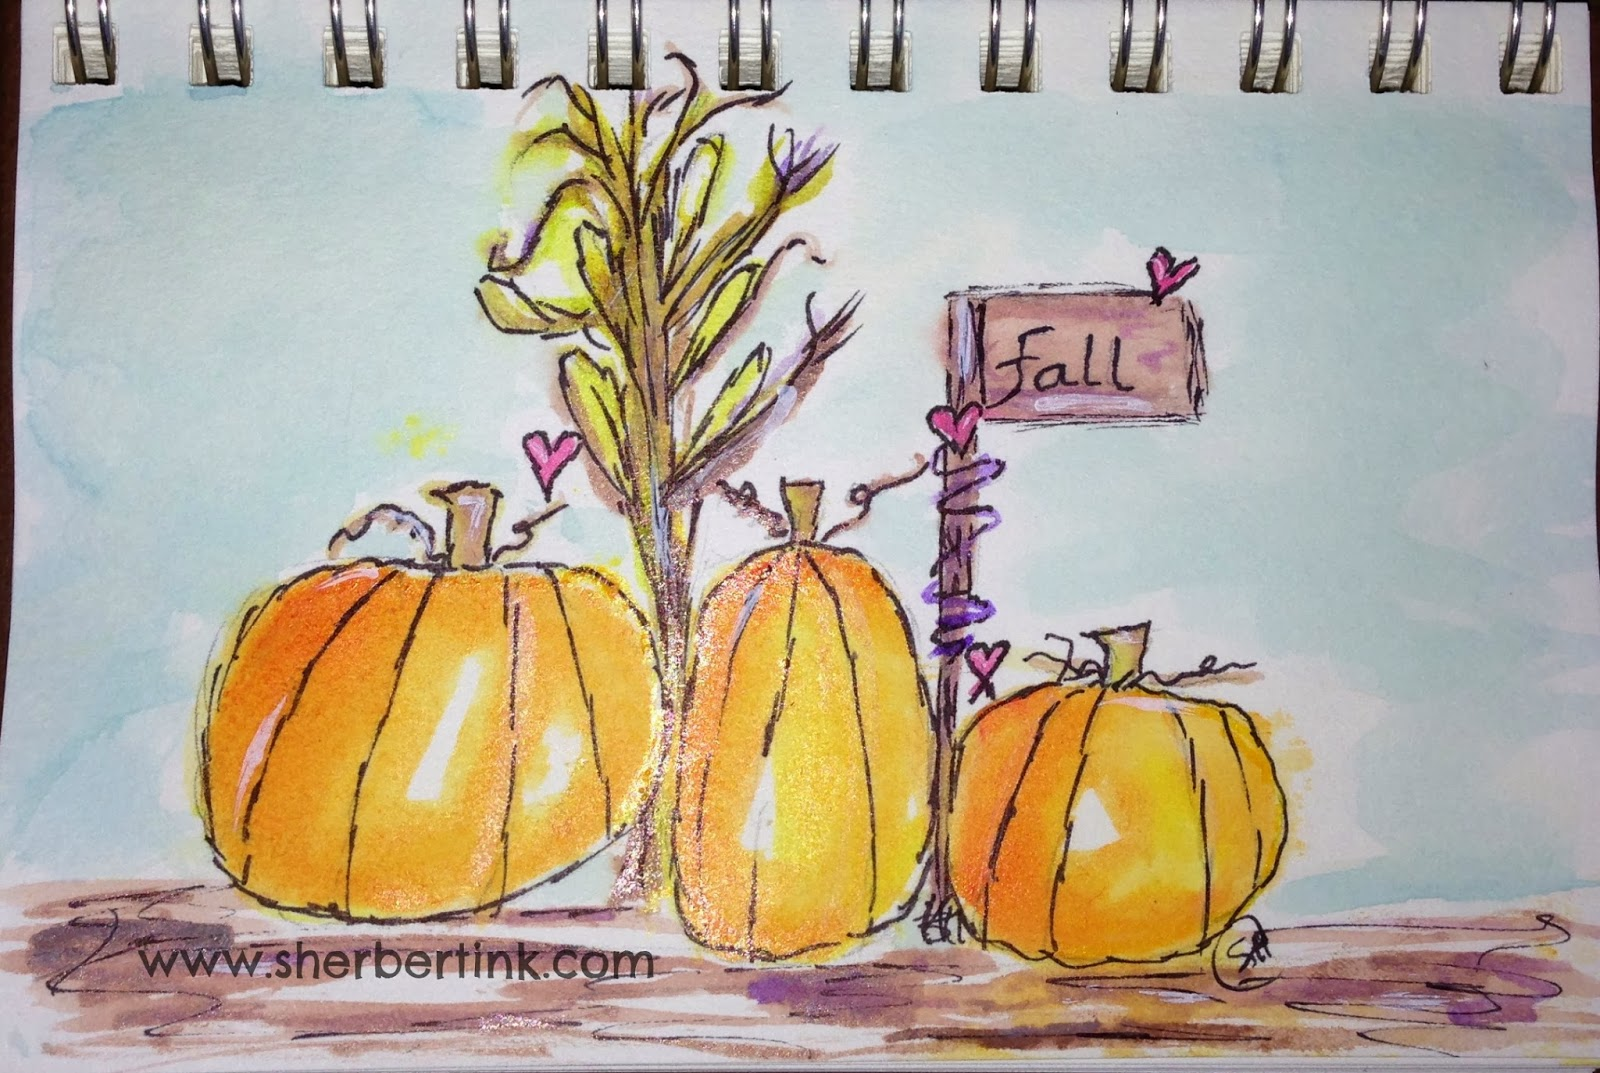 Sherbert Ink: Hey Pumpkin!~